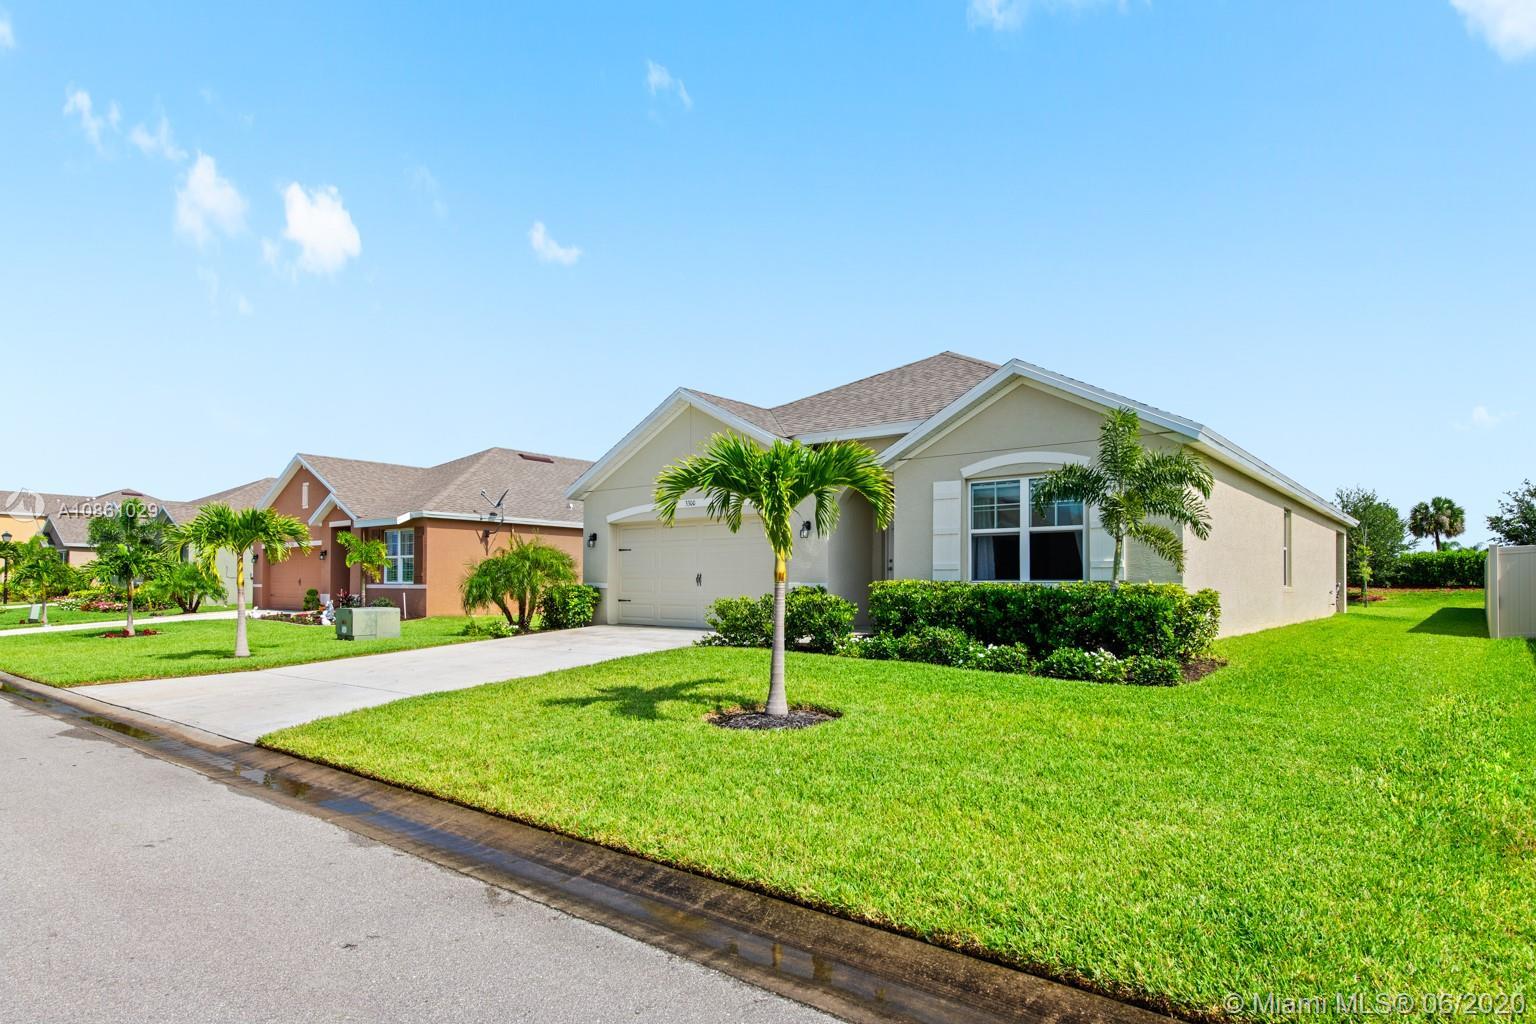 3300 SW Rockport St SW Property Photo - Vero Beach, FL real estate listing